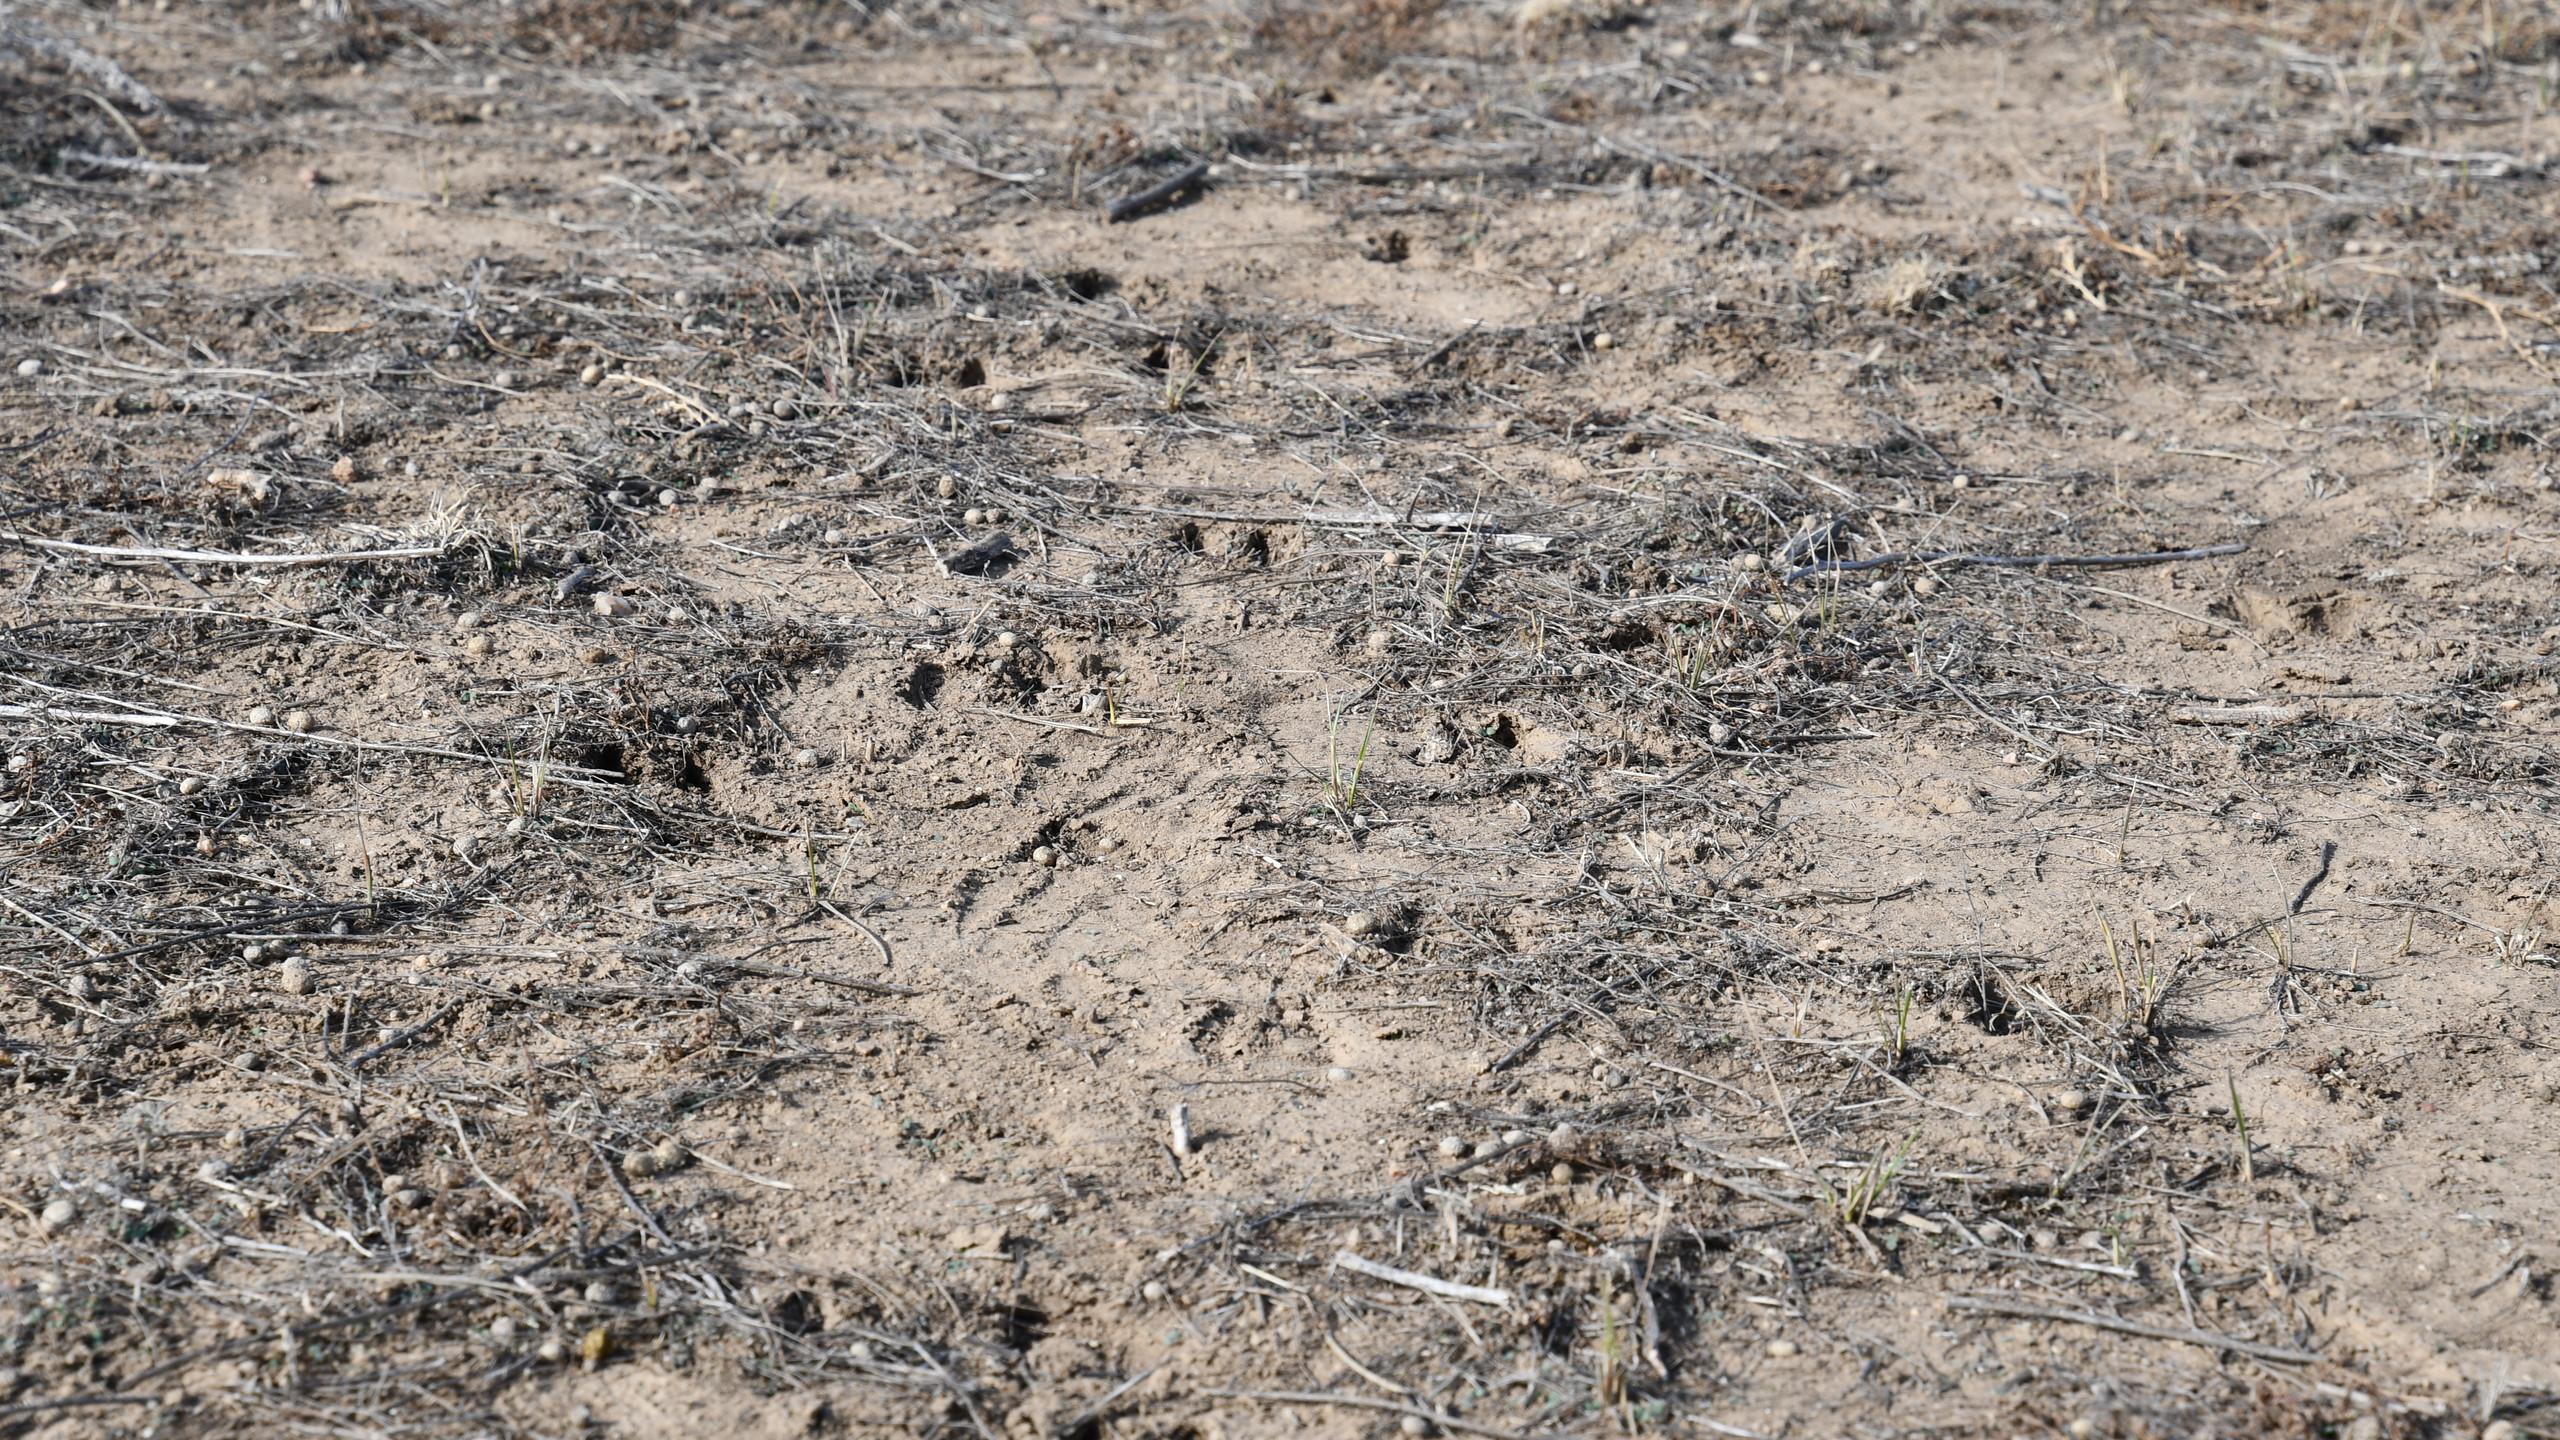 Deer tracks found on the prairie.